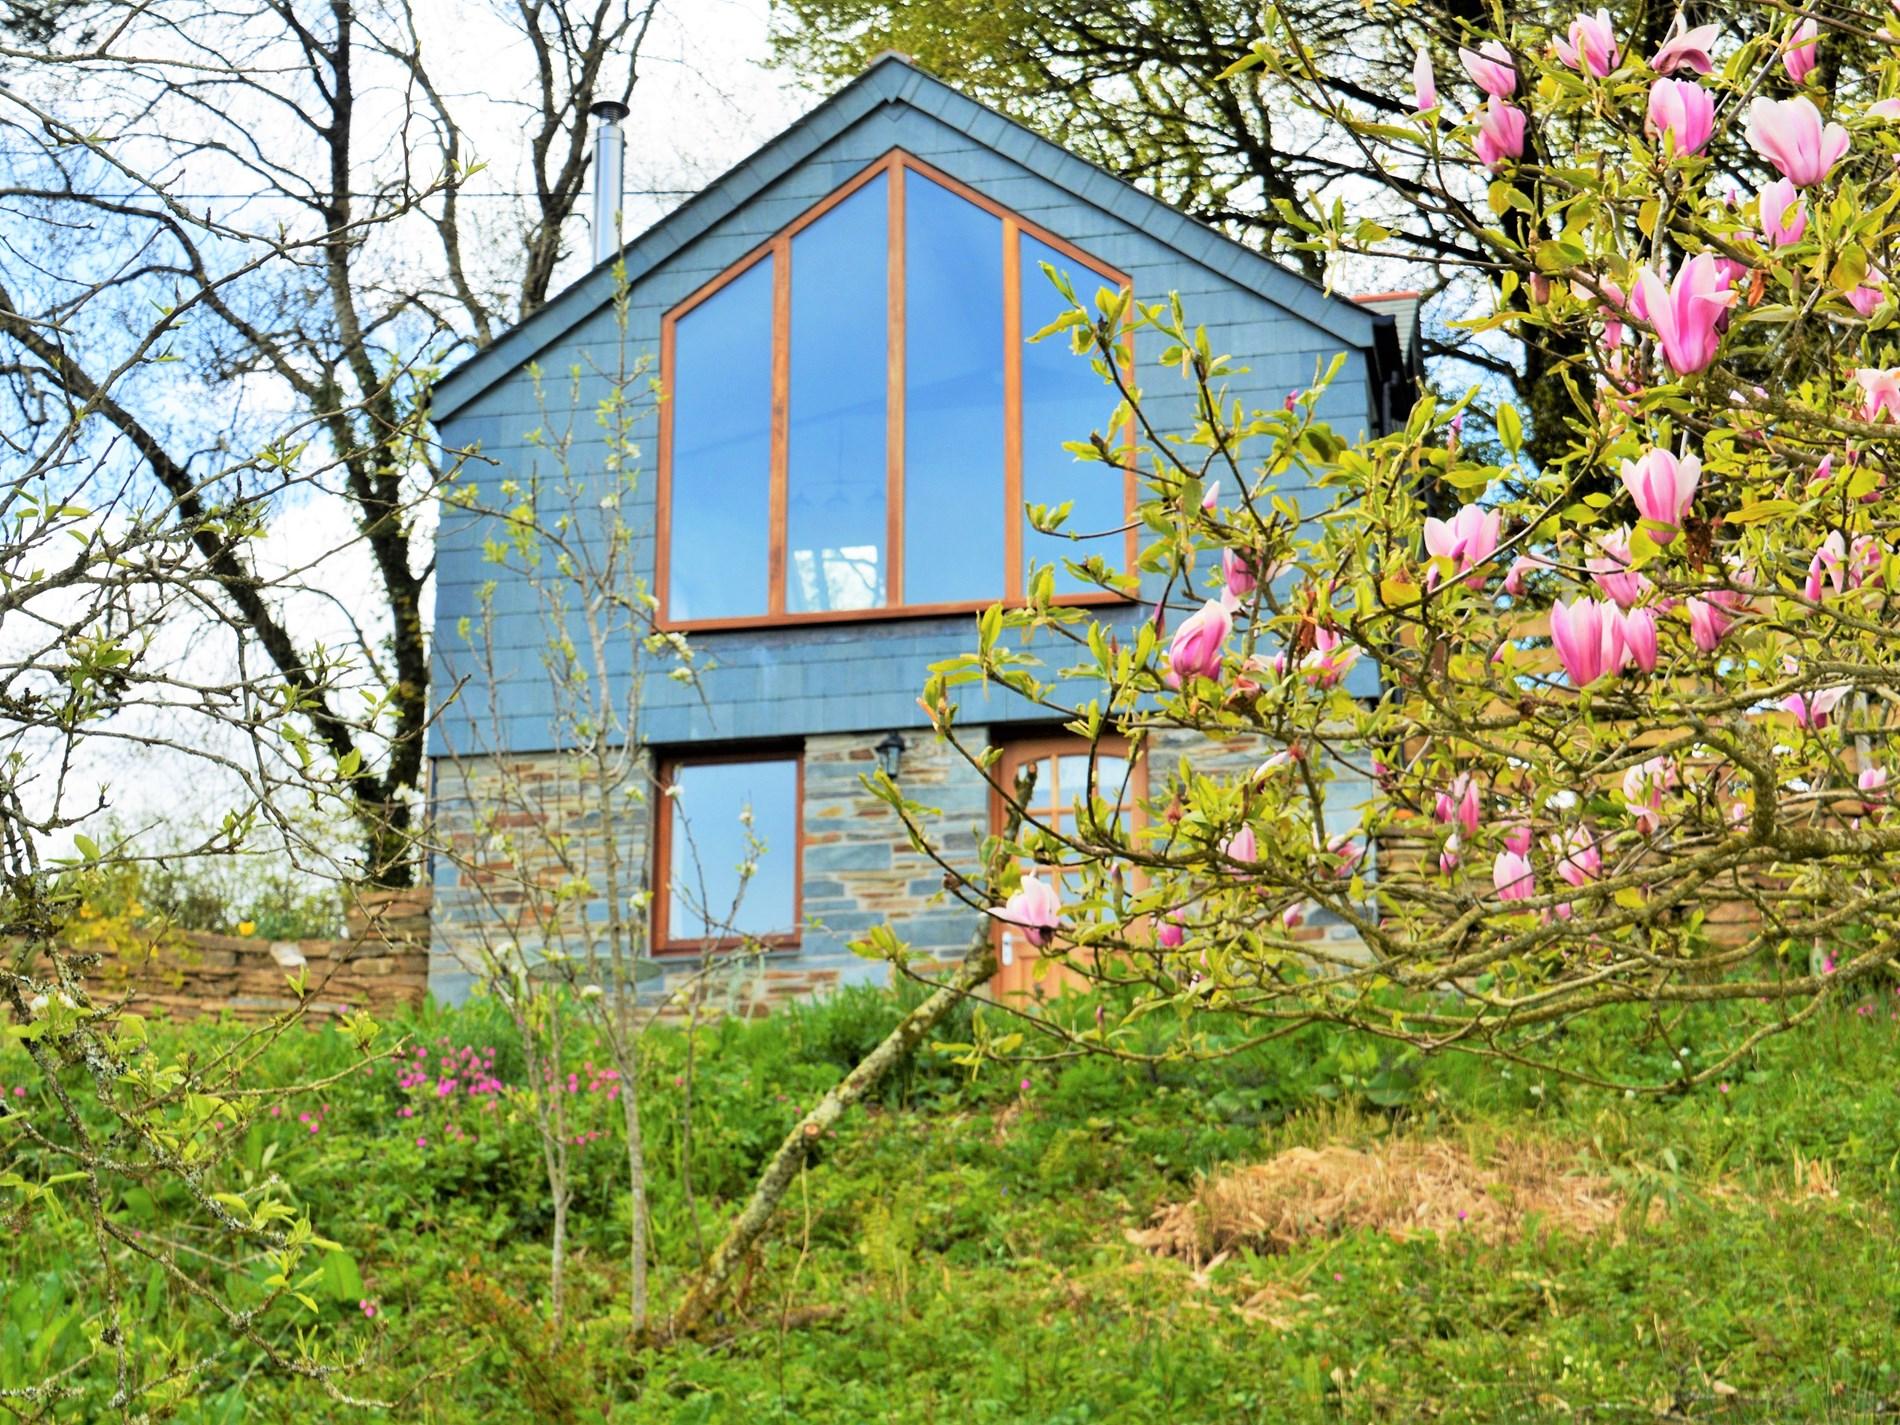 1 Bedroom Barn in South Cornwall, Cornwall